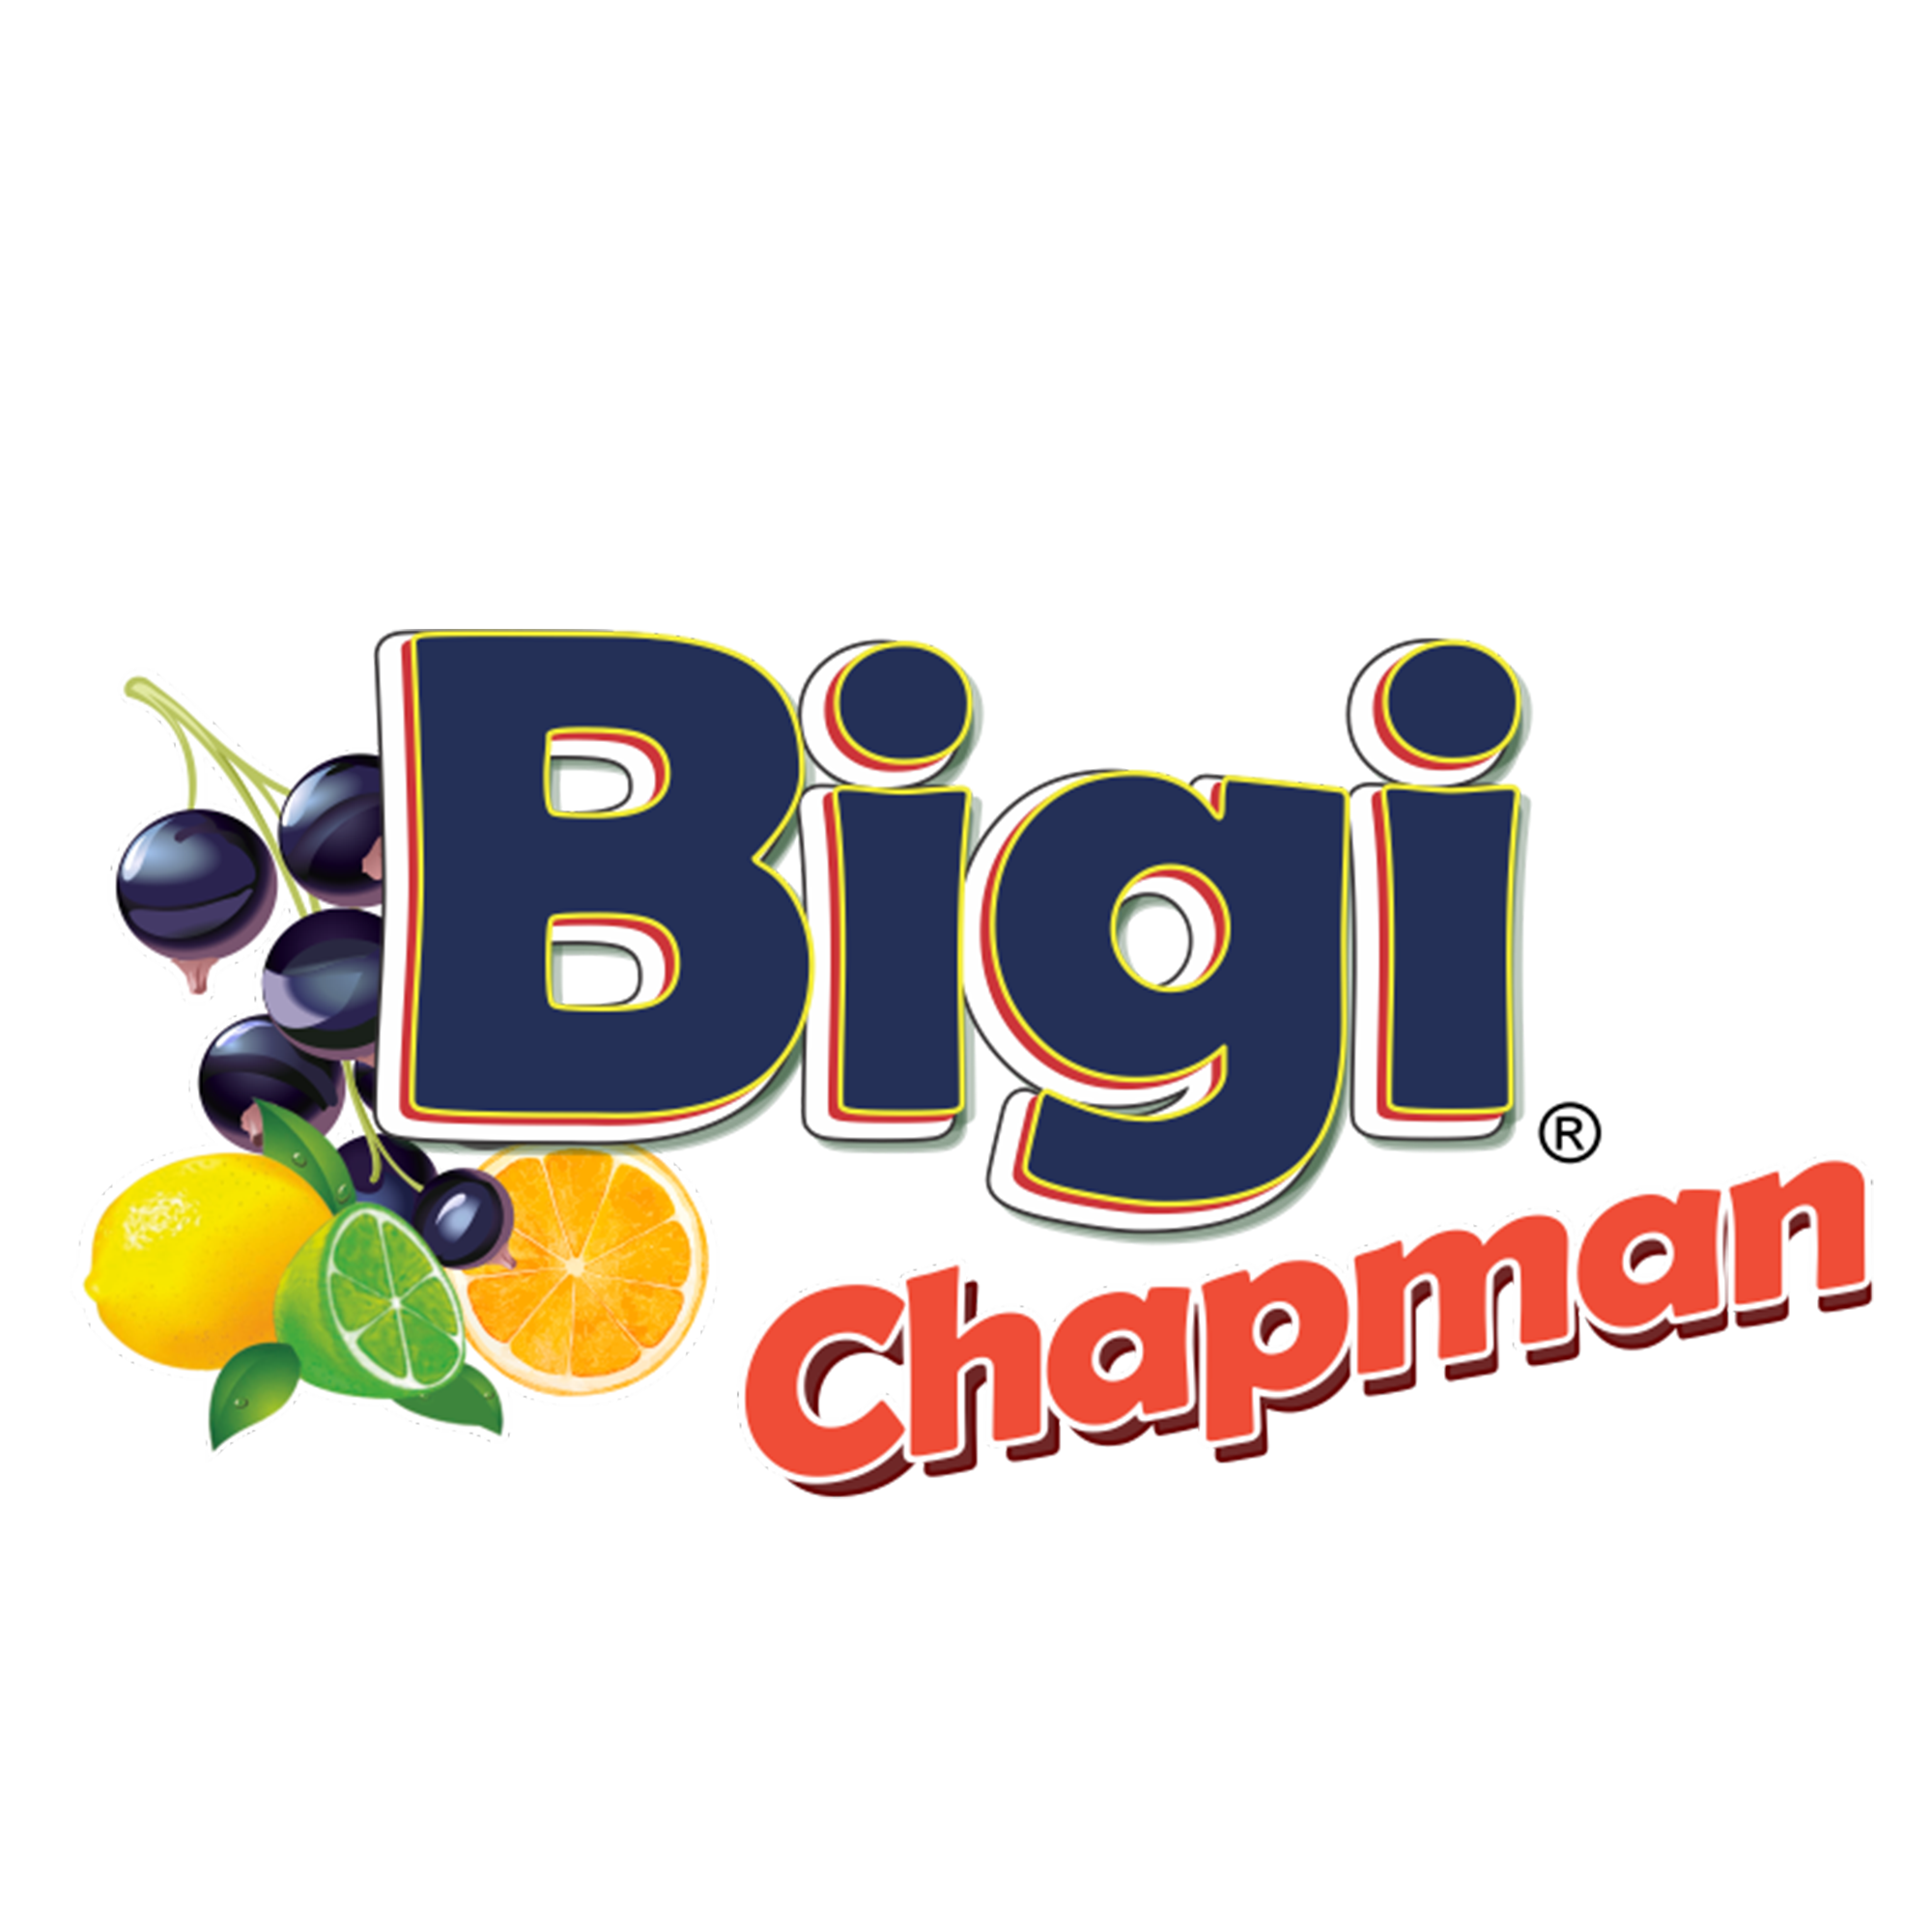 Bigi Chapman